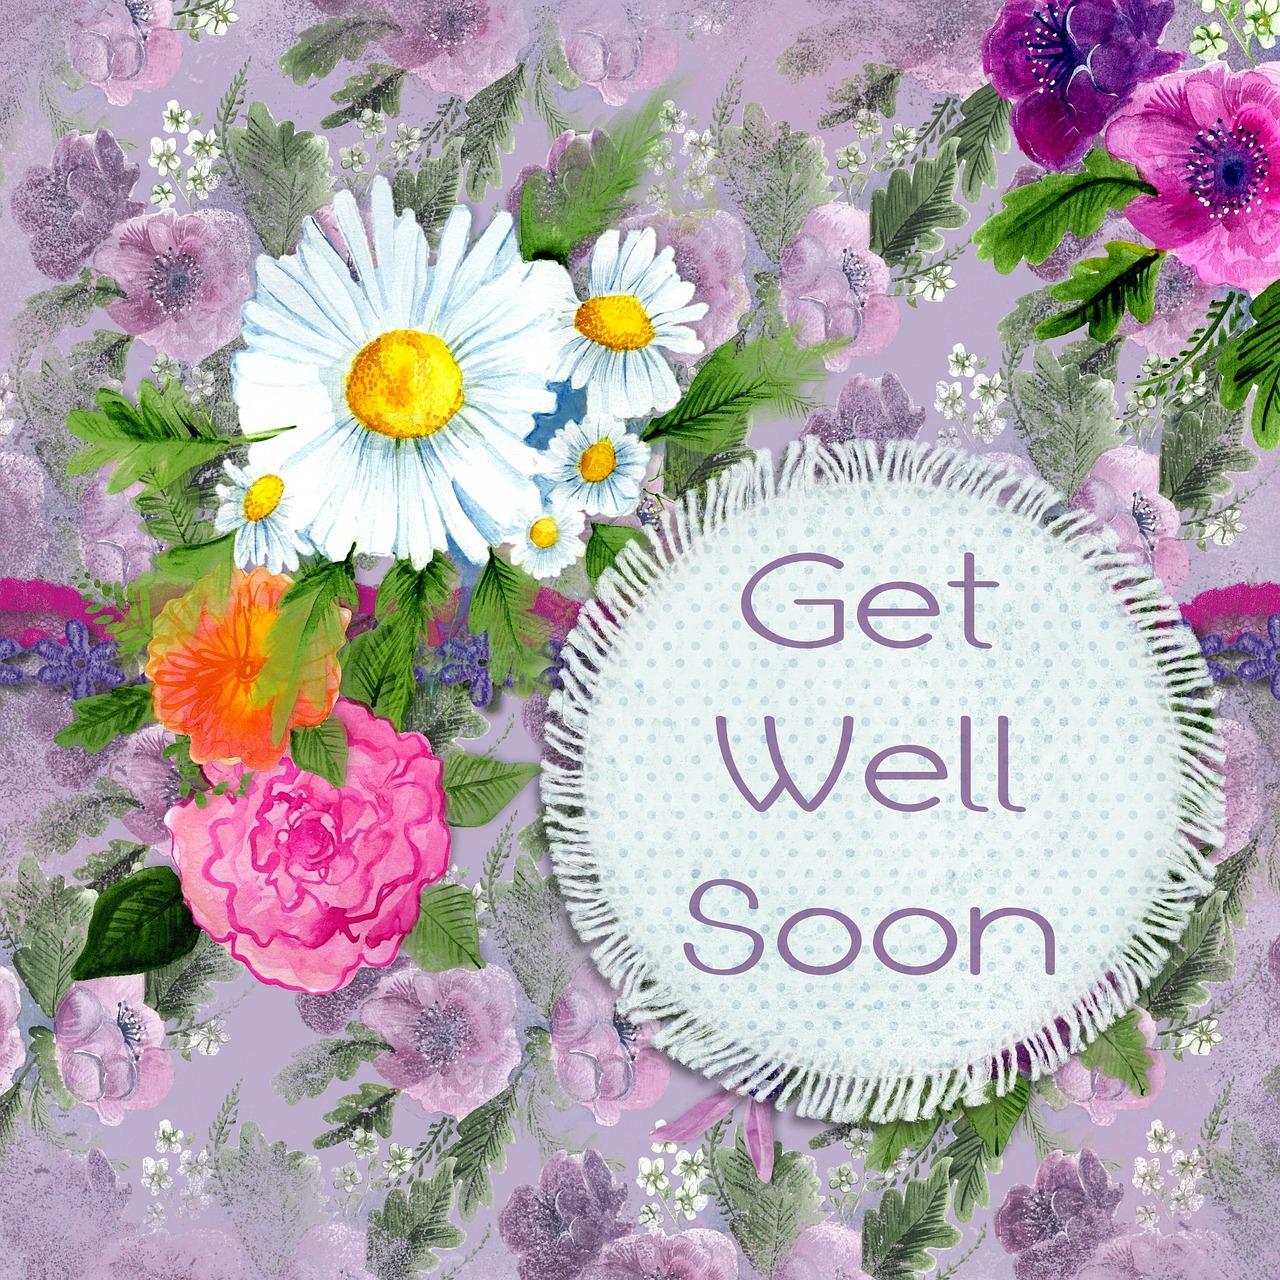 Get Wellflowergreetingcardwishes Free Photo From Needpix